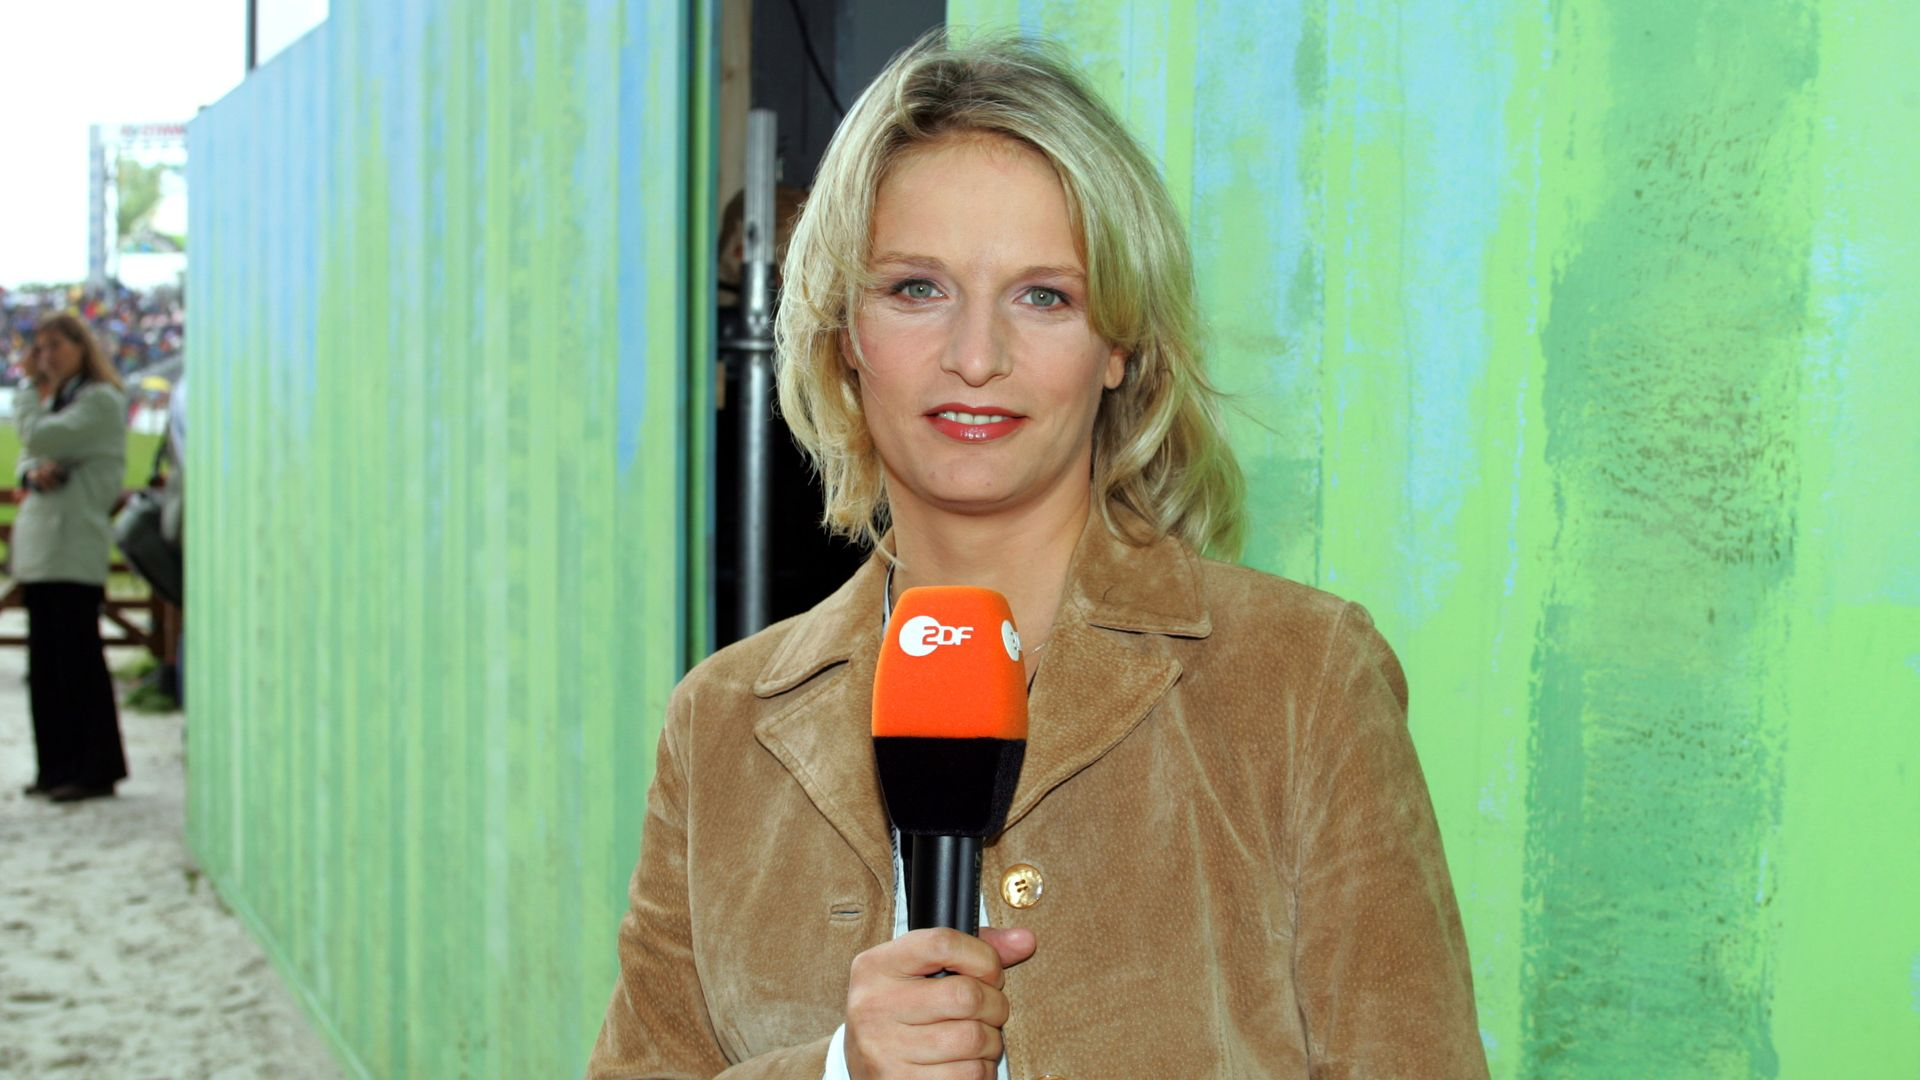 Sportreporterin Zdf